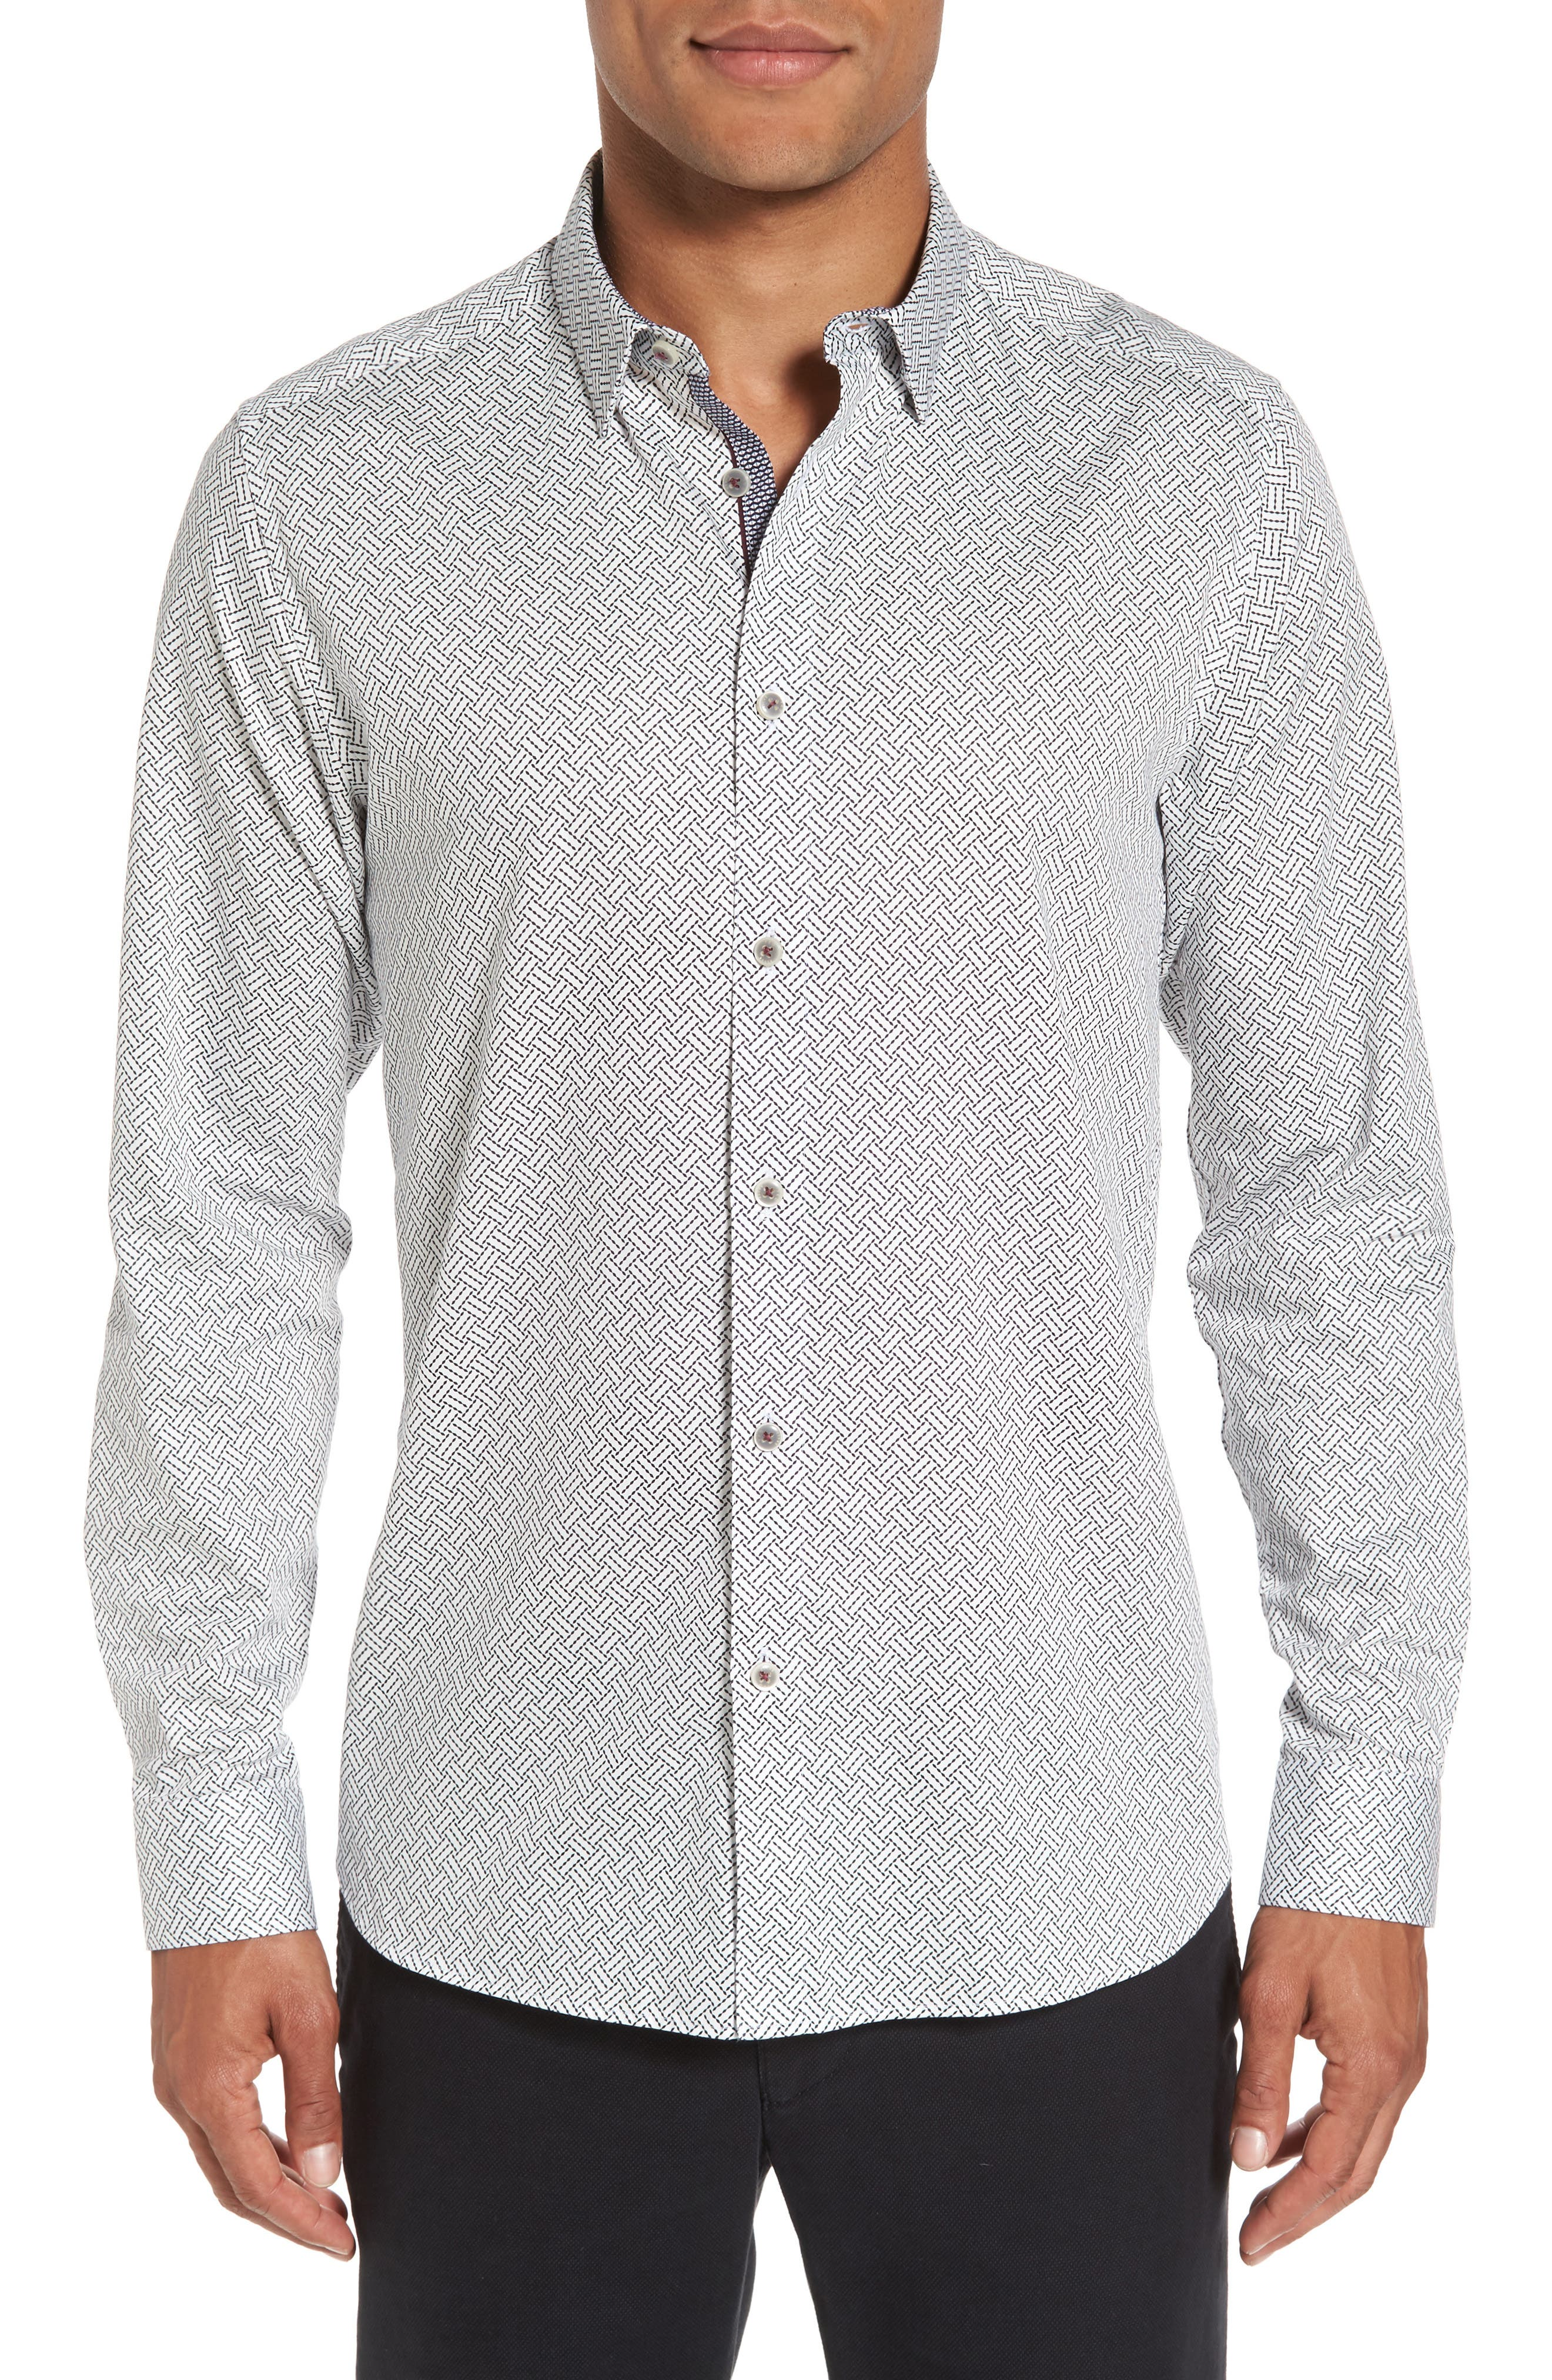 Larosh Slim Fit Basket Weave Print Sport Shirt,                         Main,                         color, White